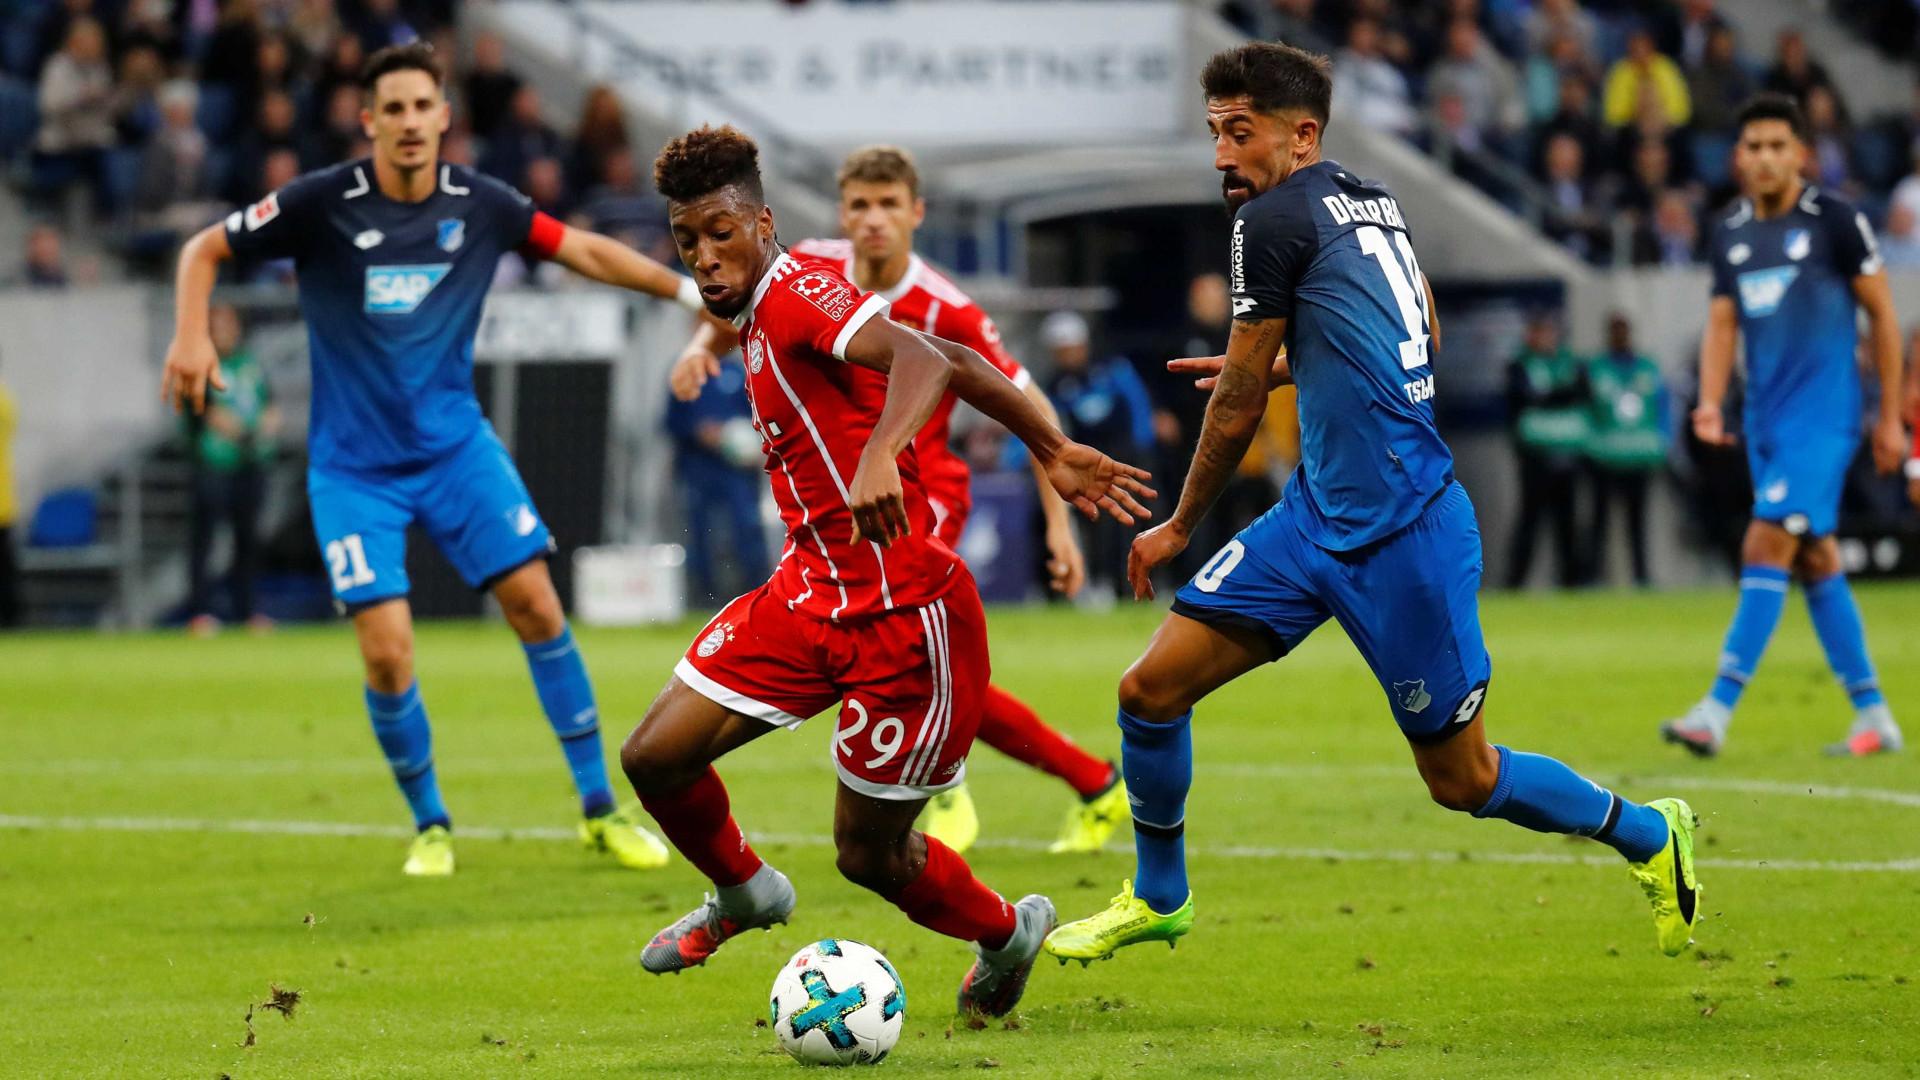 Após agredir namorada, jogador do Bayern vai pagar multa inacreditável